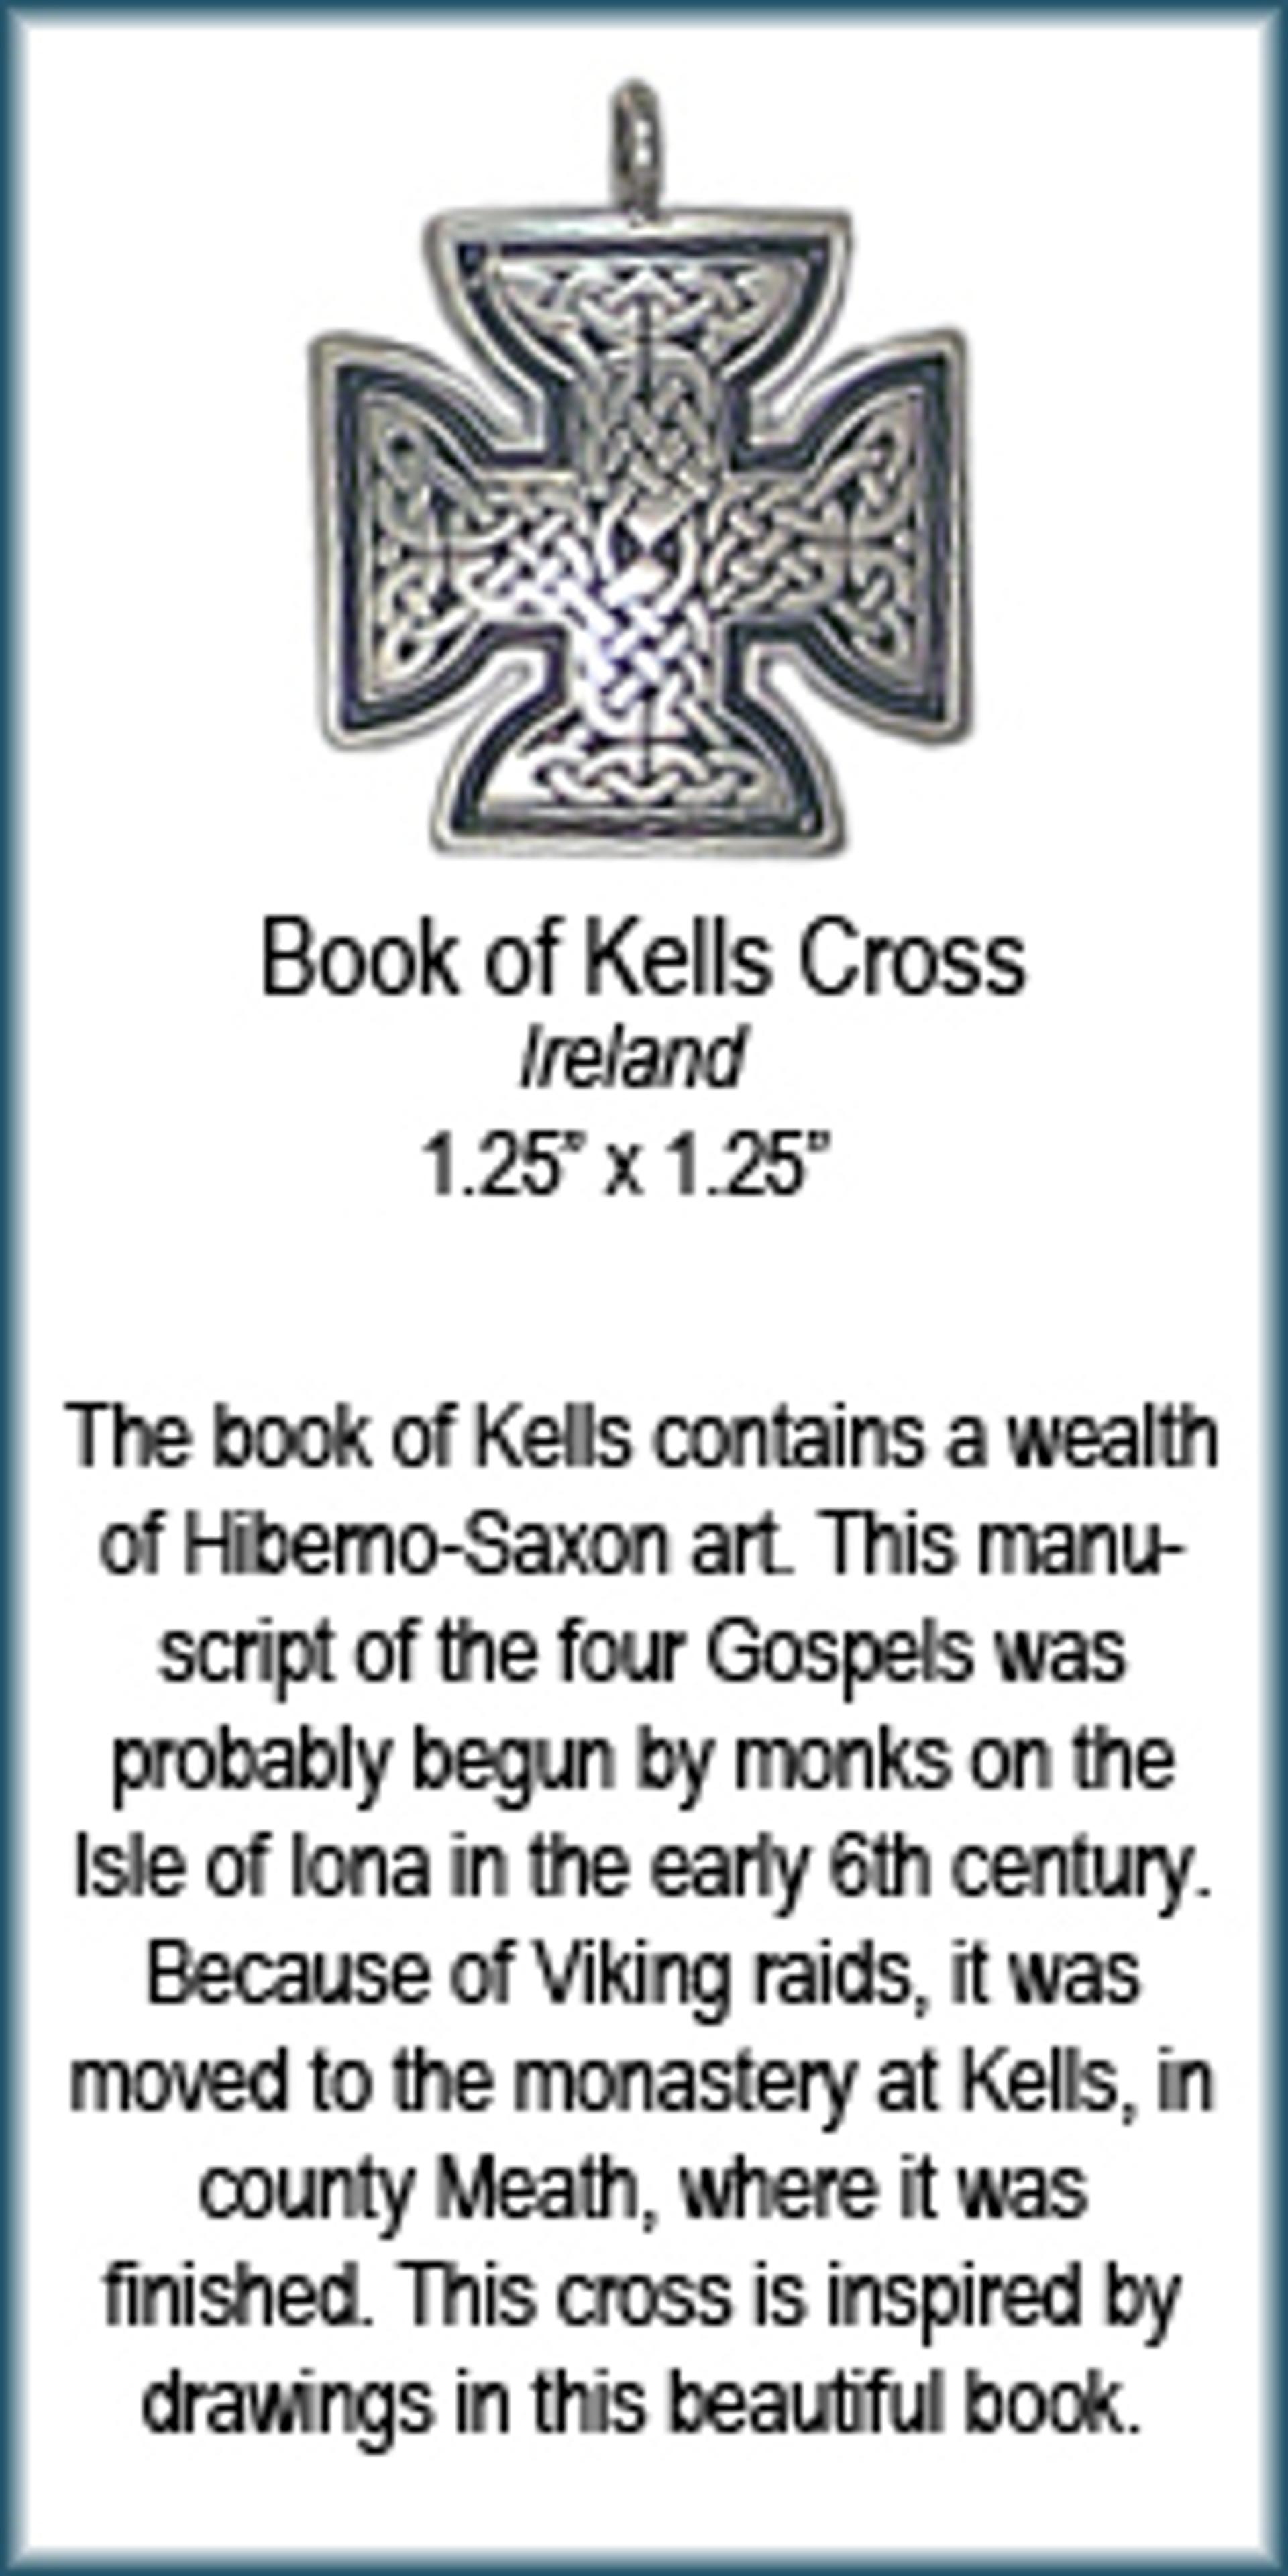 Pendant - Book of Kells Cross - 4370 by Deanne McKeown